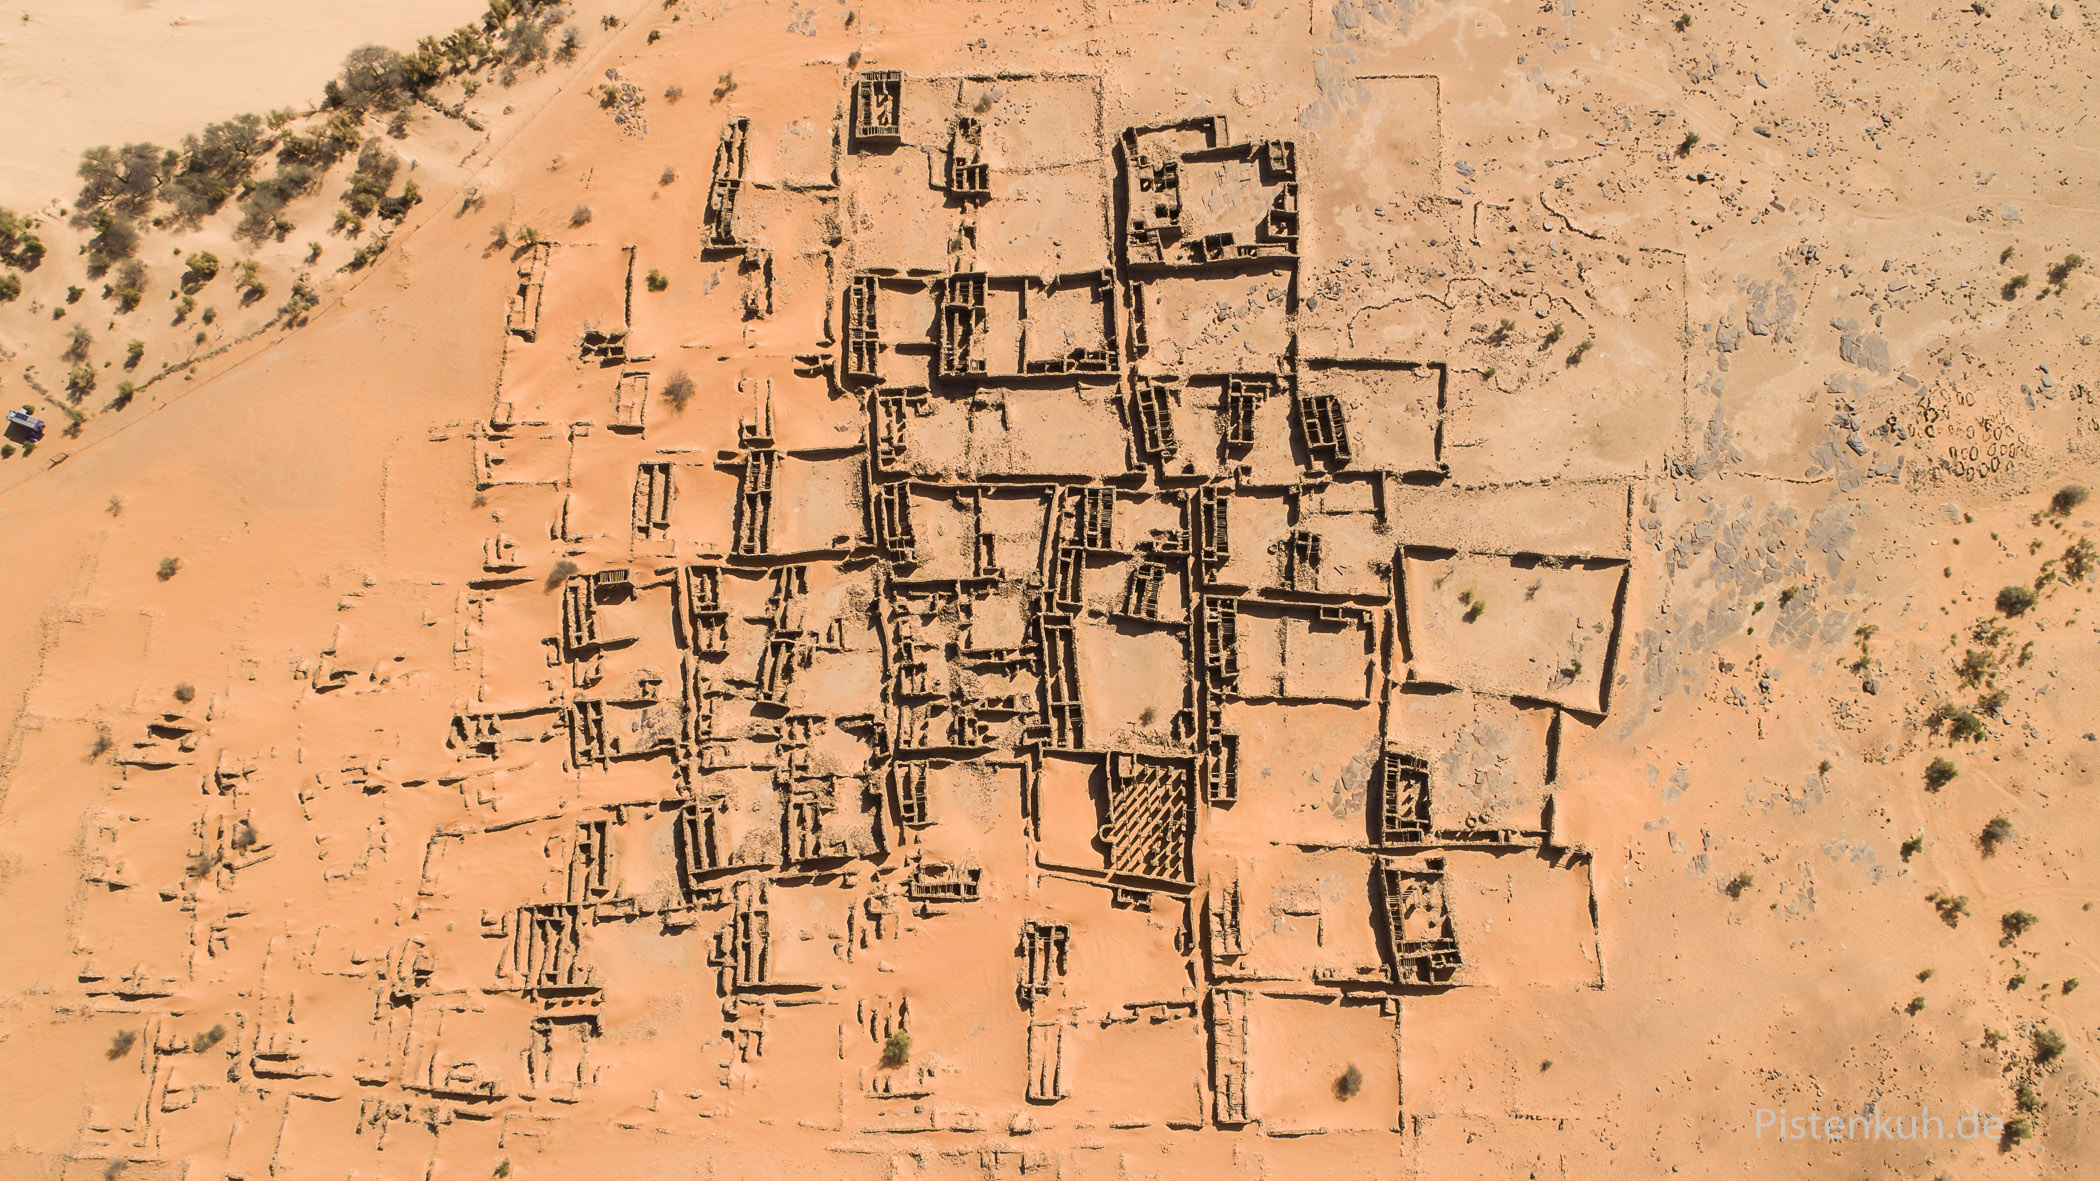 Ksar el Barka, die Ruinenstadt in Mauretanien